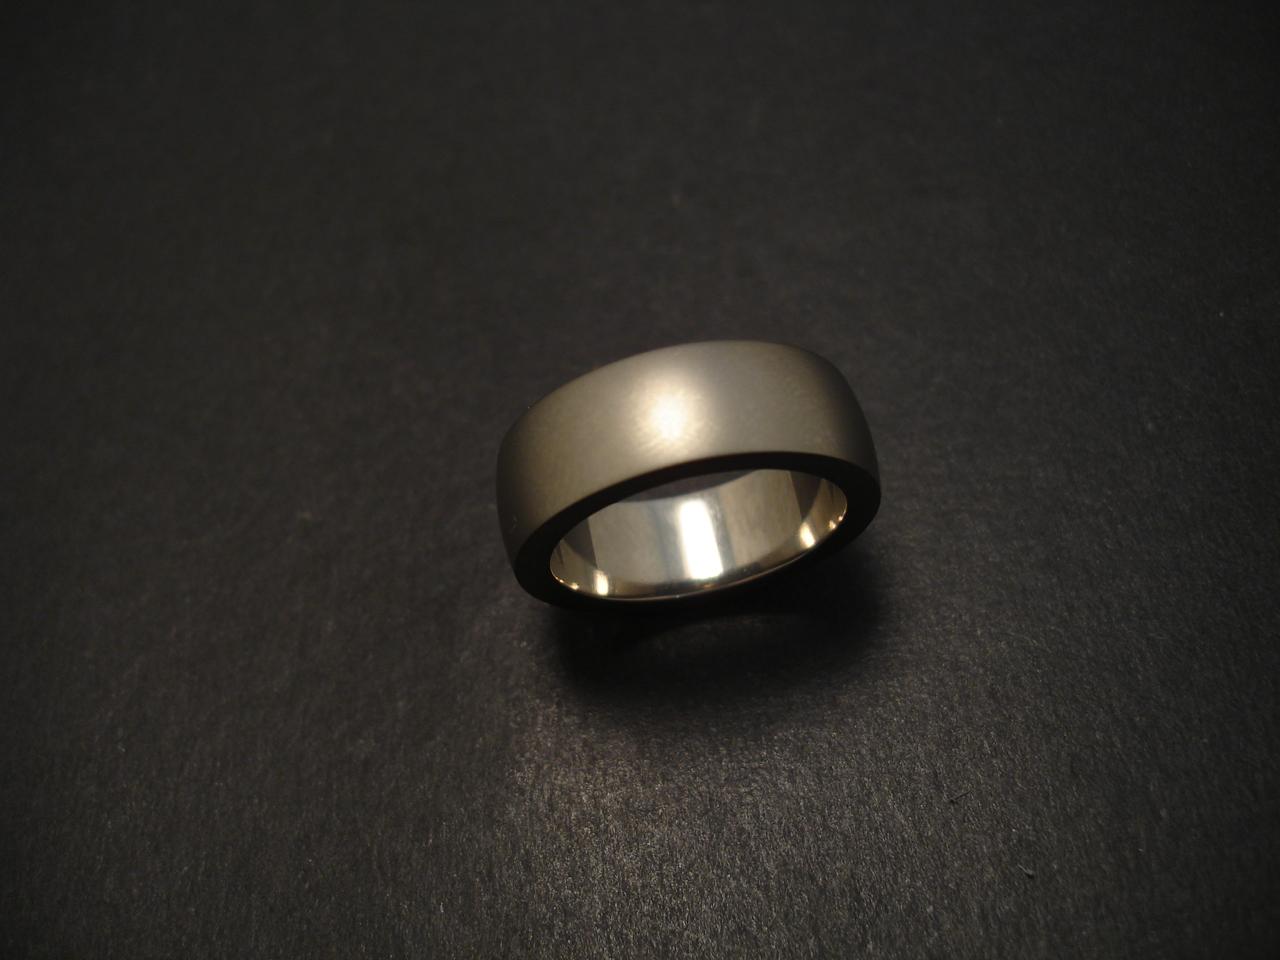 mens wedding rings australia – the best wedding photo blog